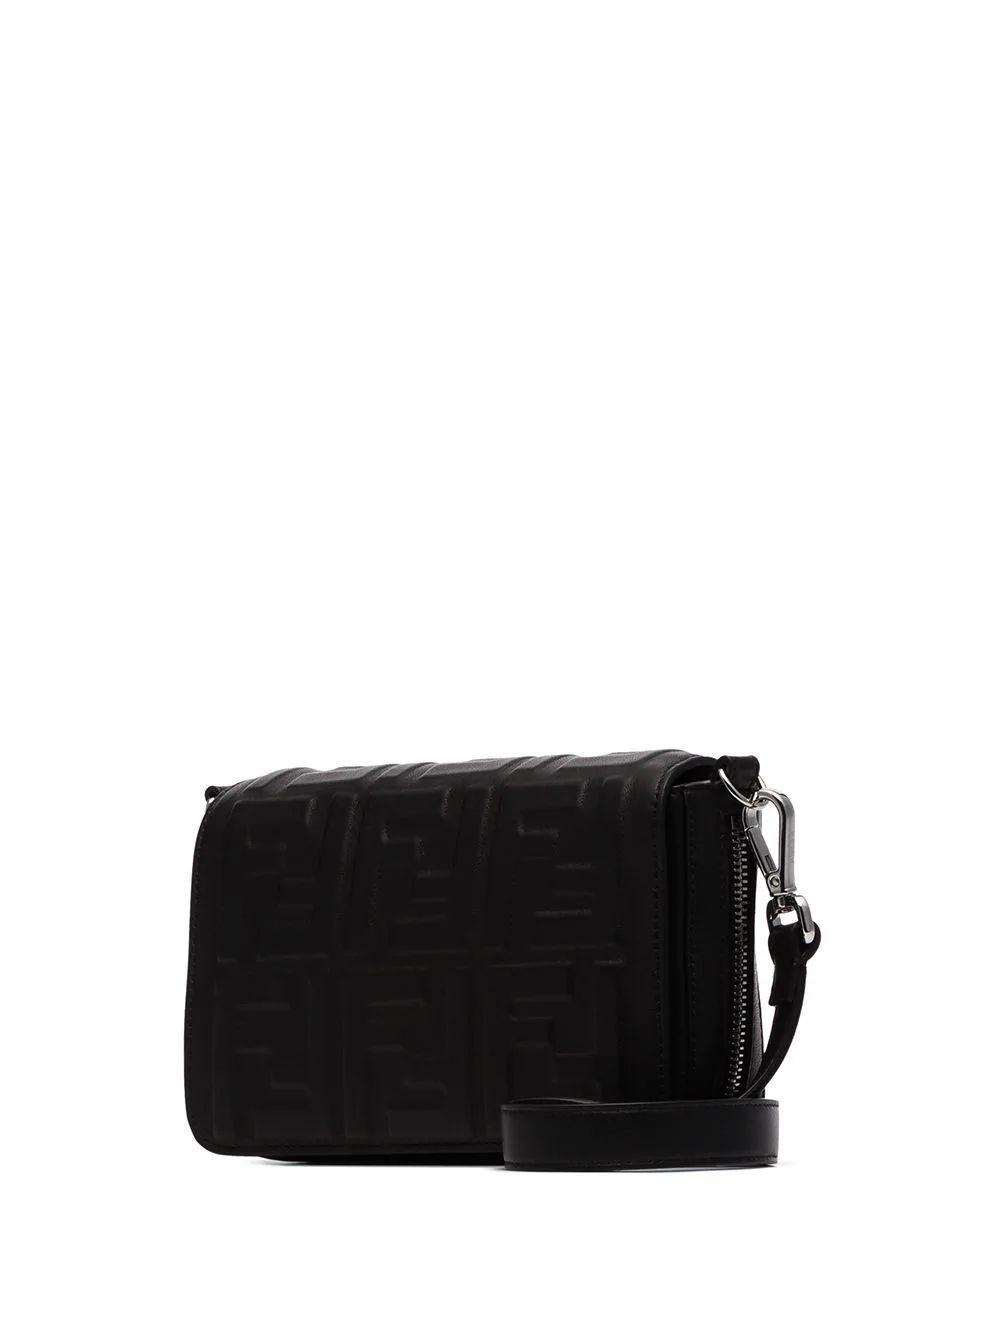 FENDI MEN'S 7M0299A72VF0GXN BLACK LEATHER MESSENGER BAG